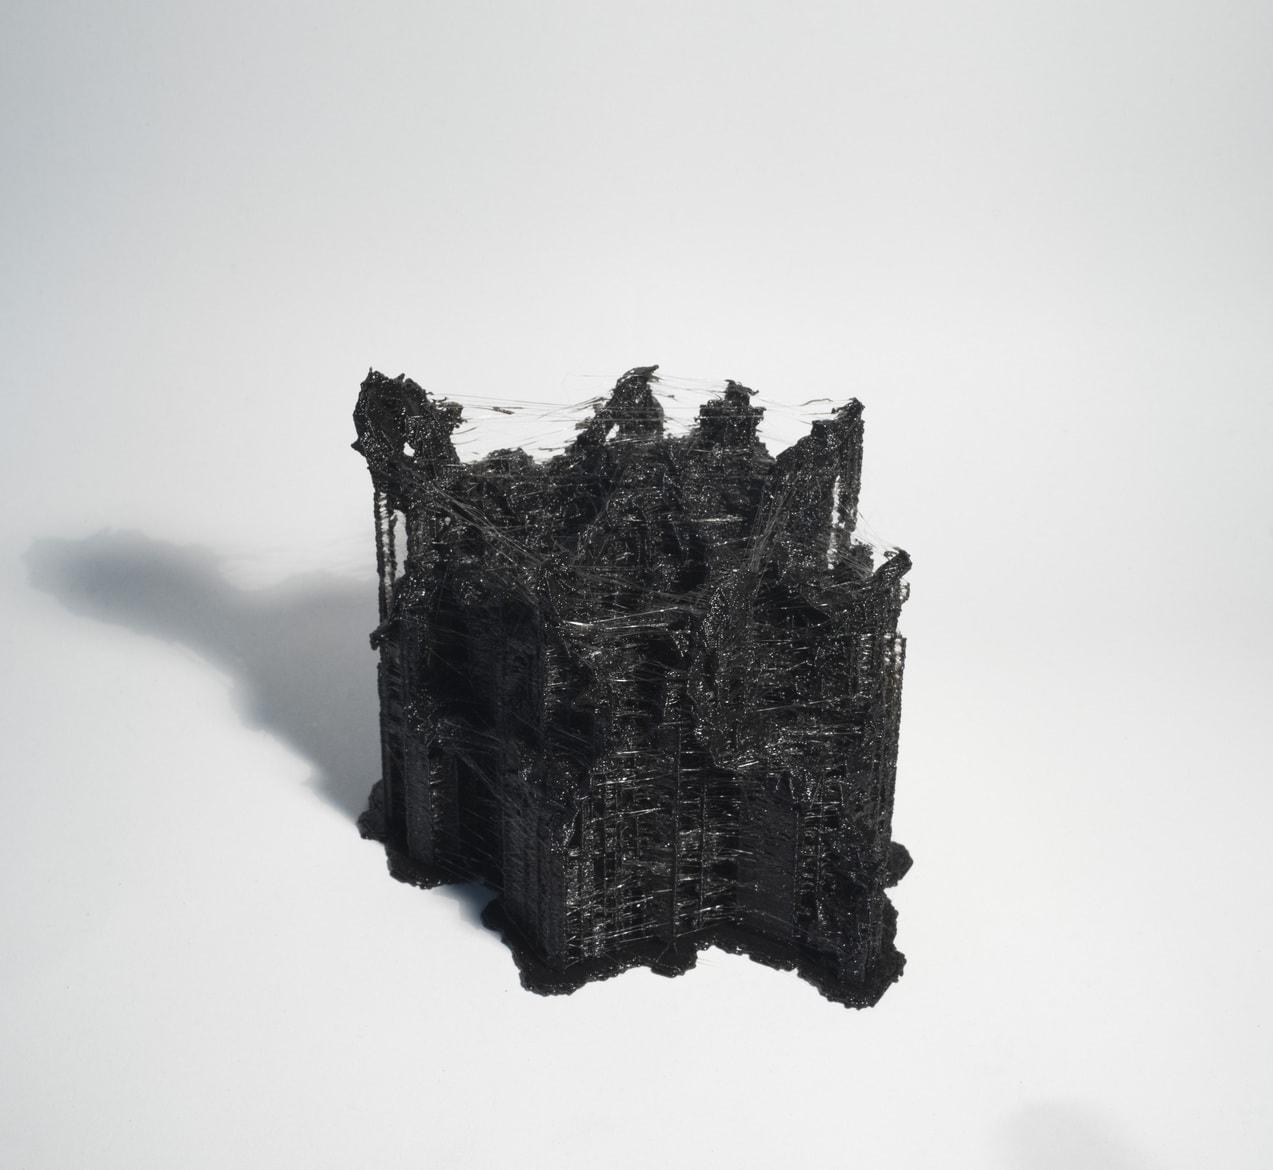 'Metamodel.dna (clostridium difficile ~ homo sapiens)', 2015, 3D printed PLA plastic, DNA data, 10 x 10 x 10 cm, edition of 3 + 1AP